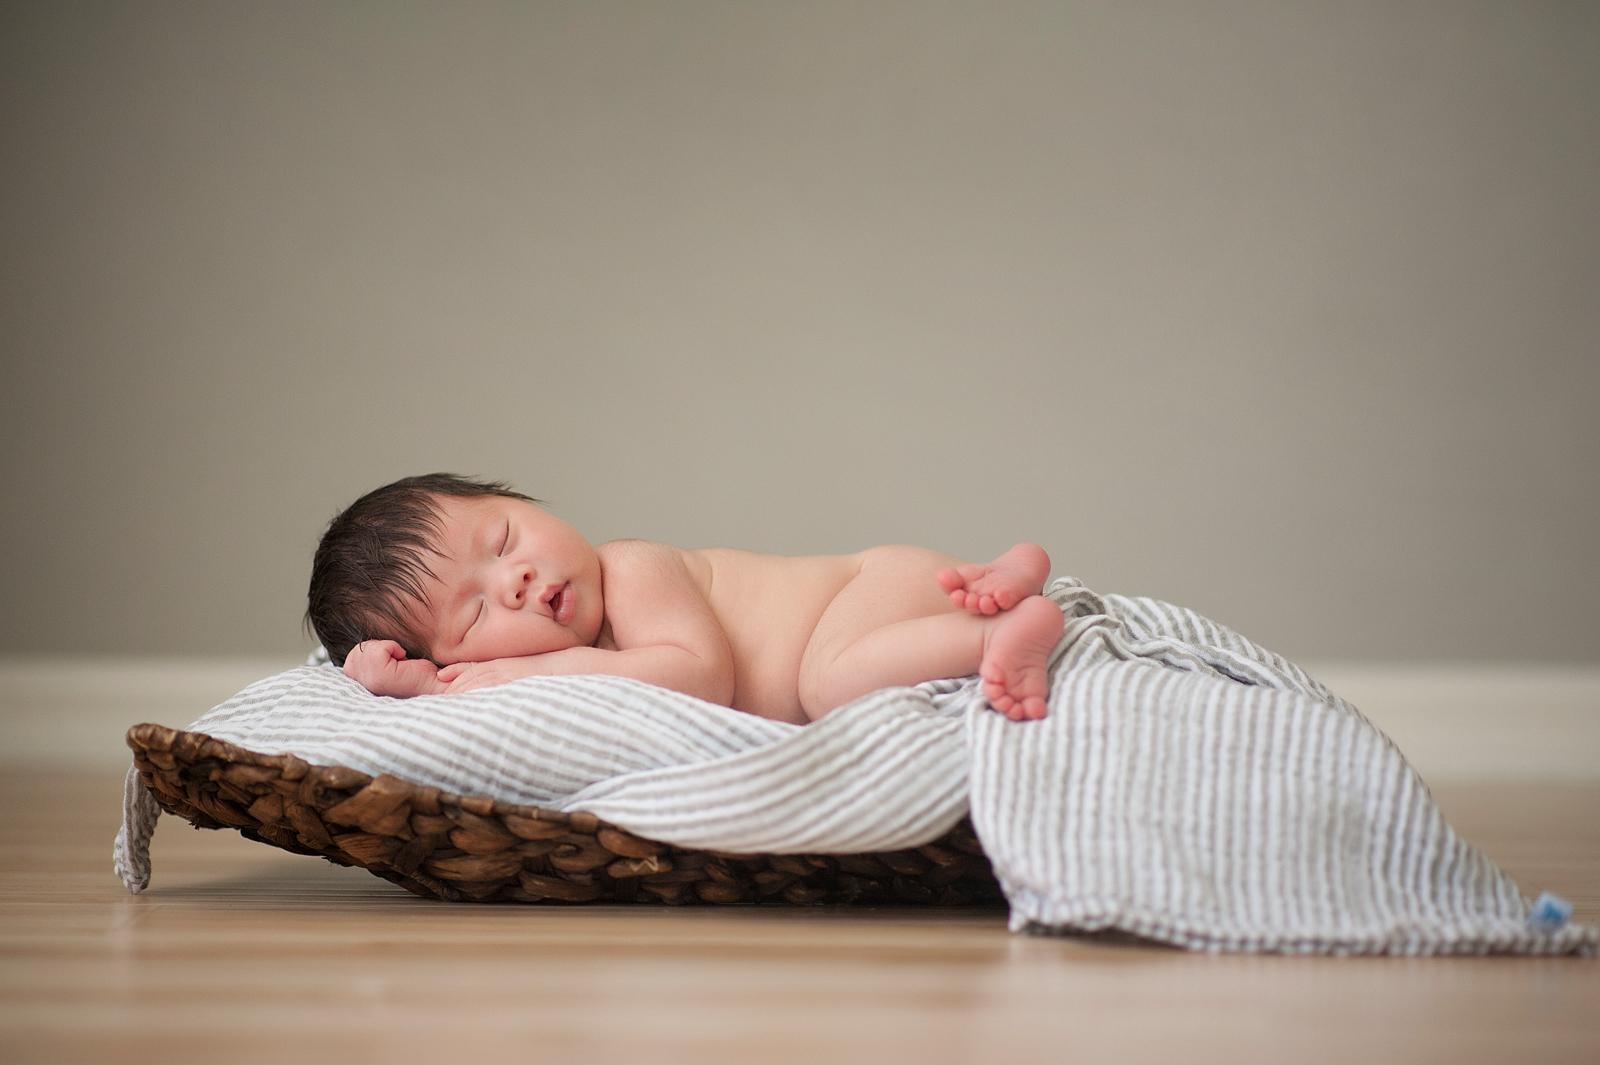 13-cute-chubby-baby-resting-pillow-studio-portrait.jpg